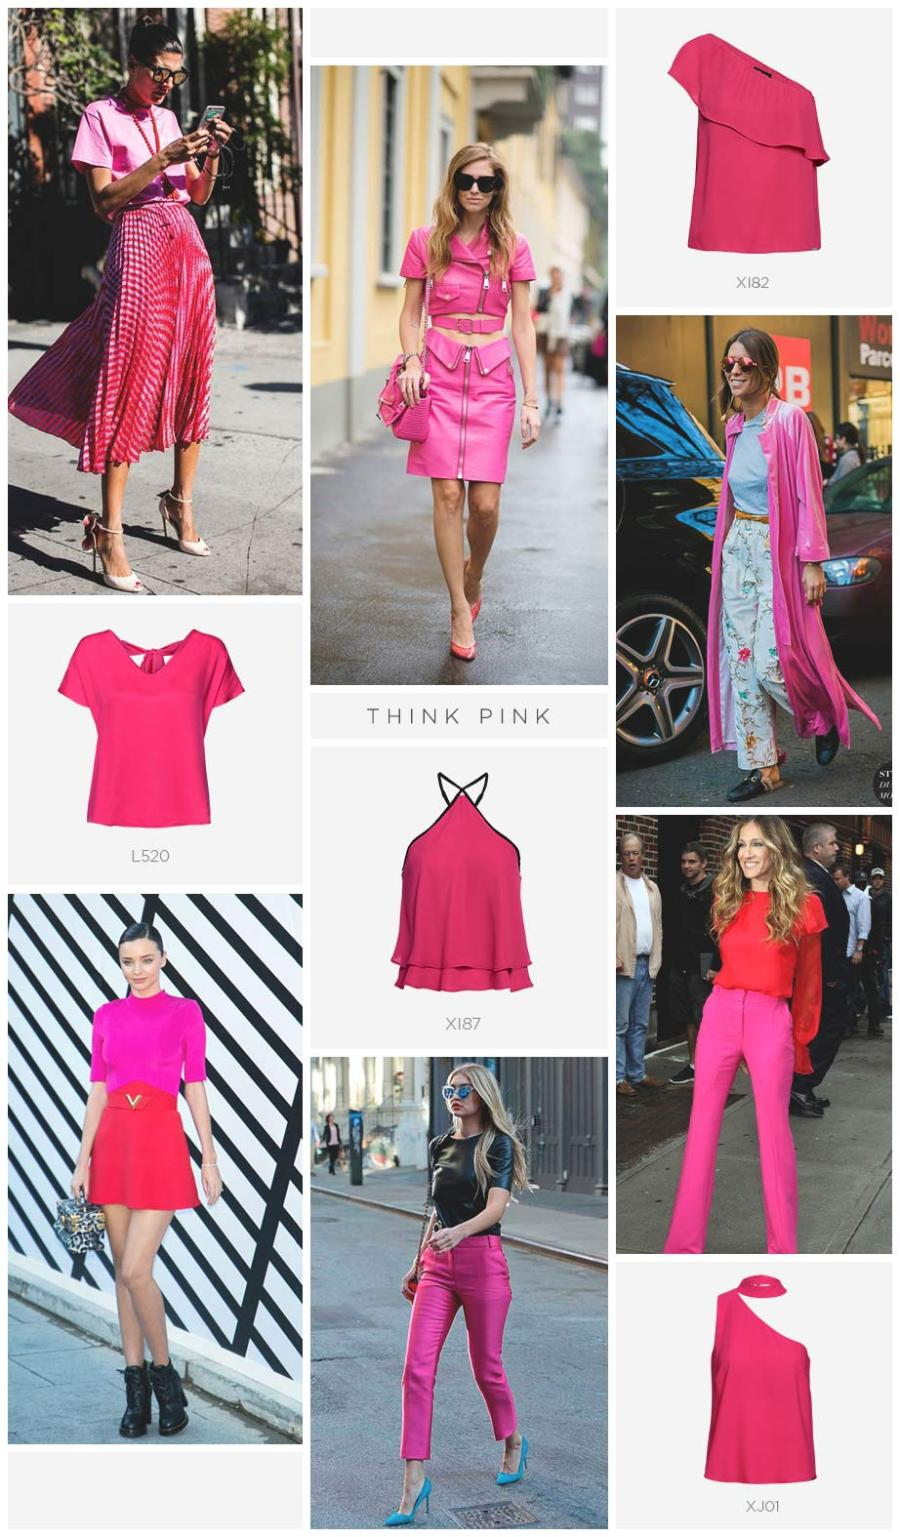 Como usar roupas pink no street style